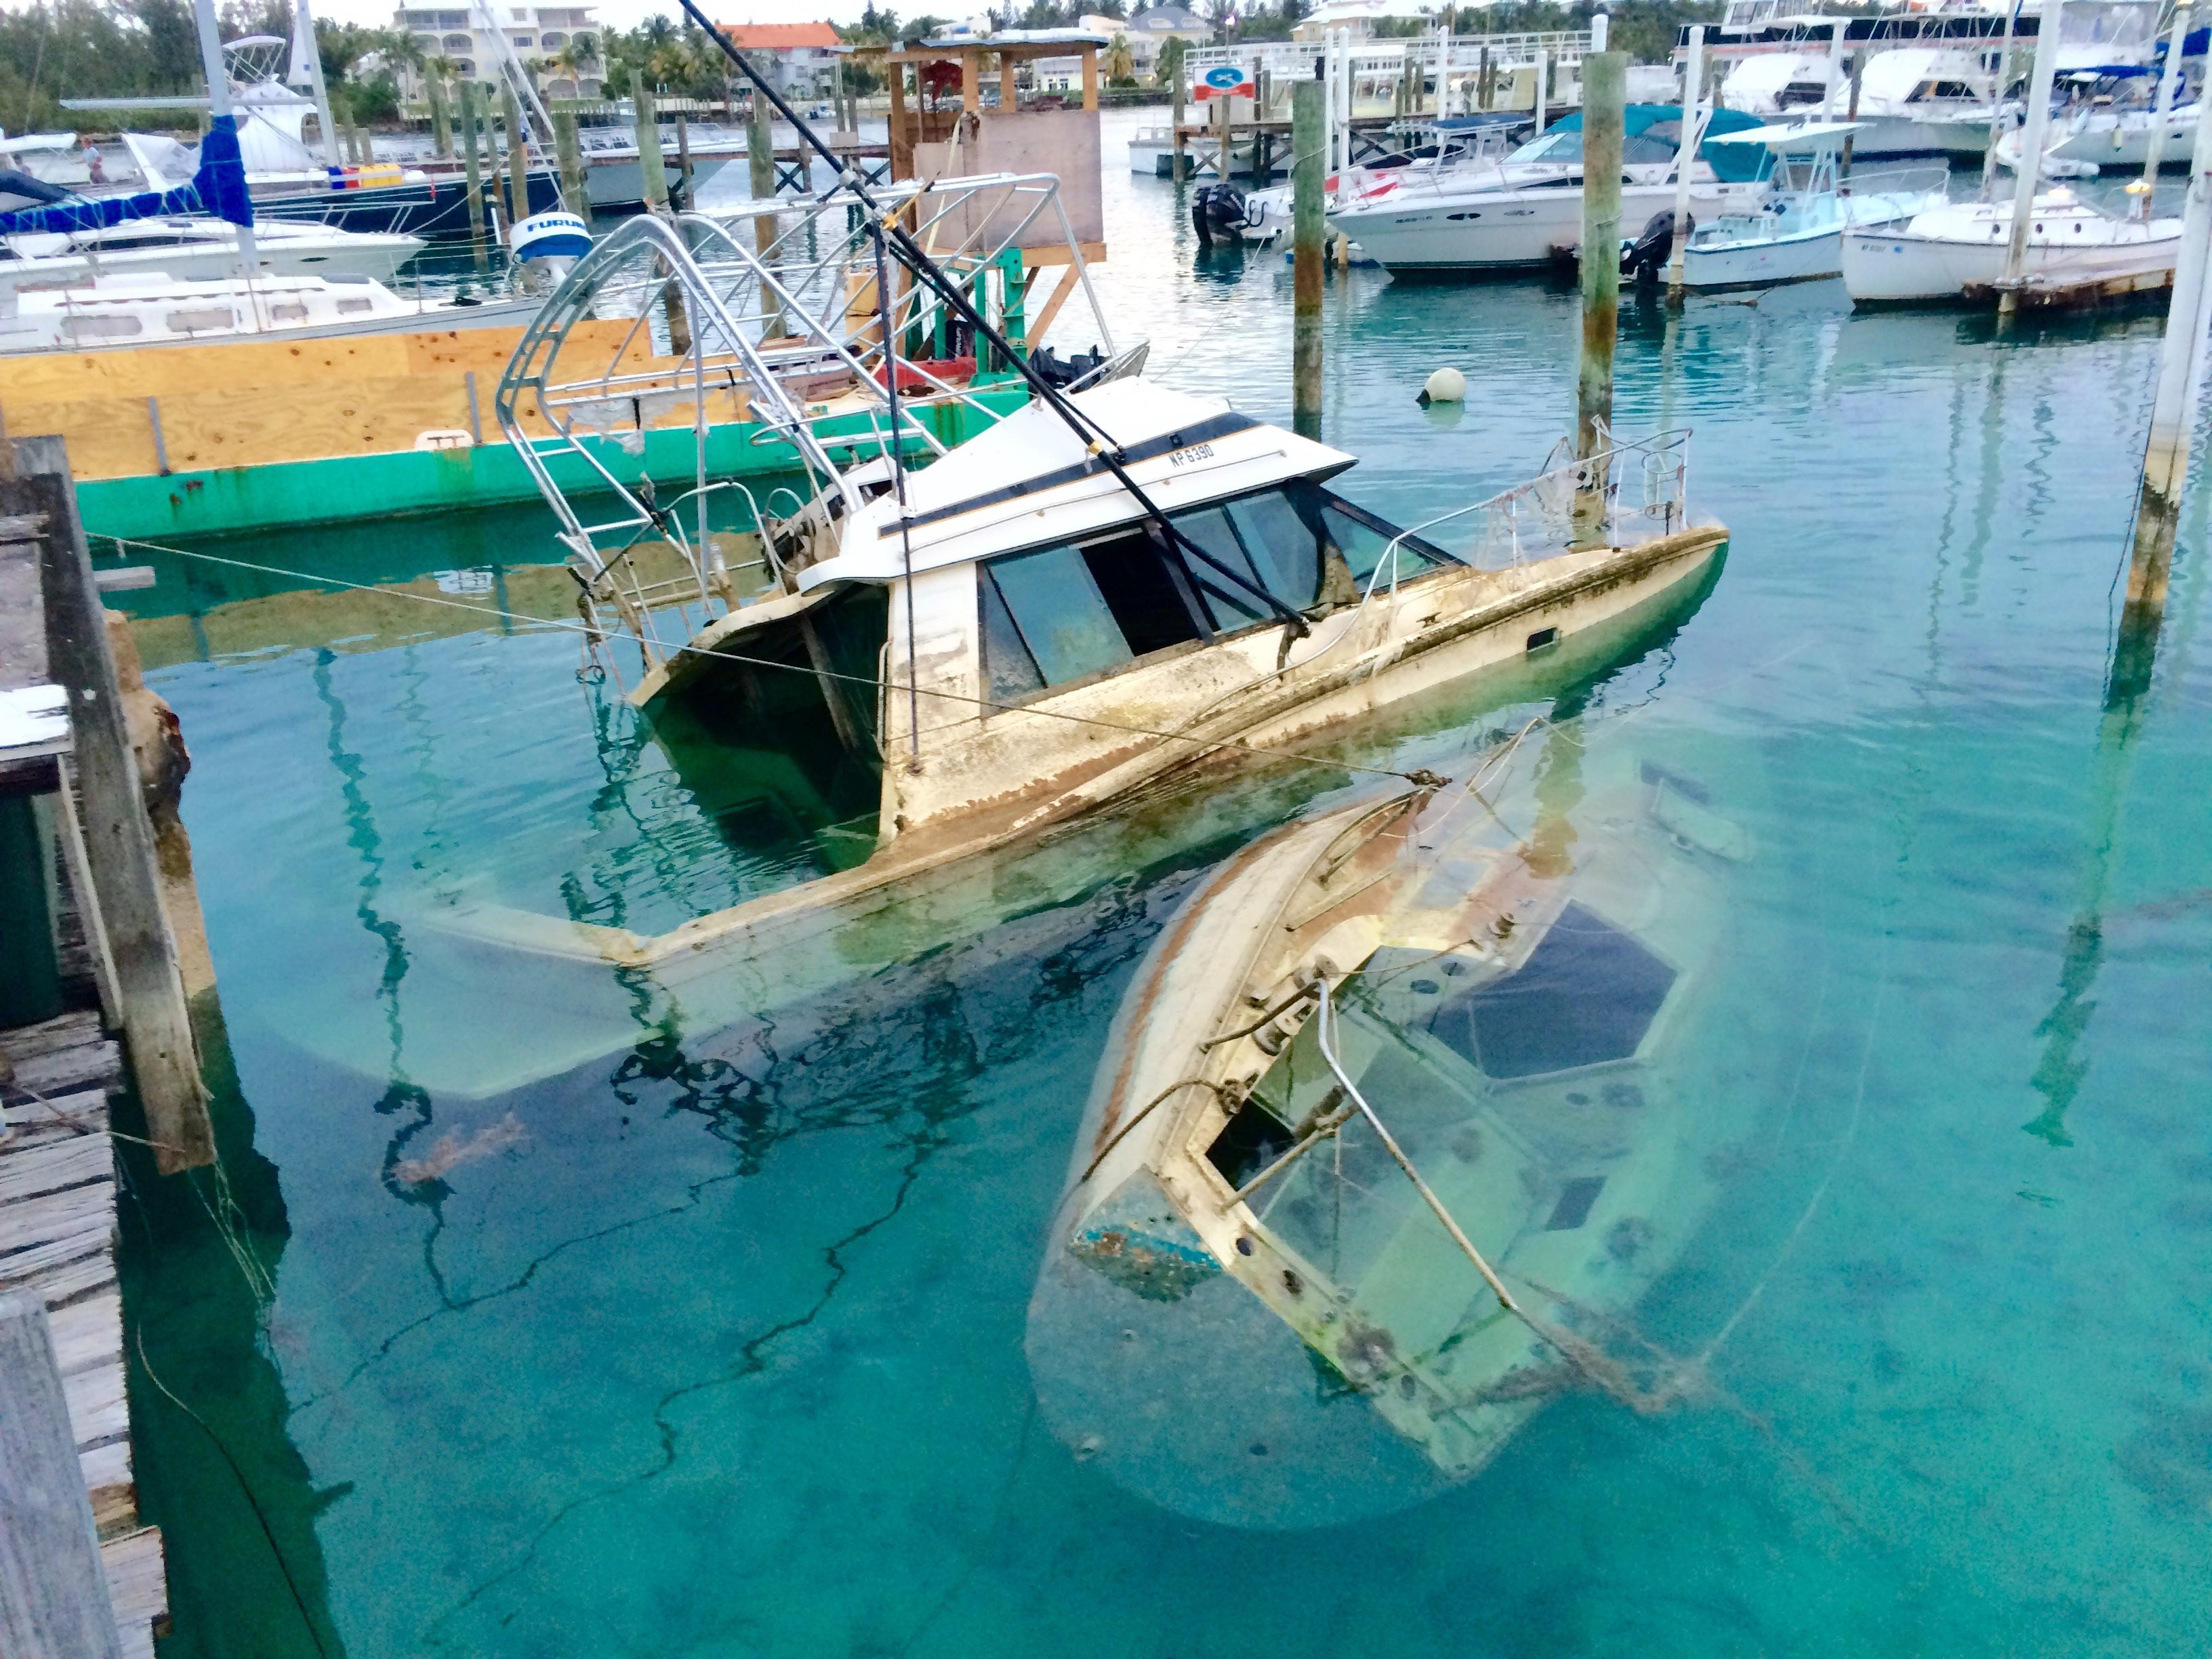 Nassau To Normans Cay Exumas AL Aboard The Sailing